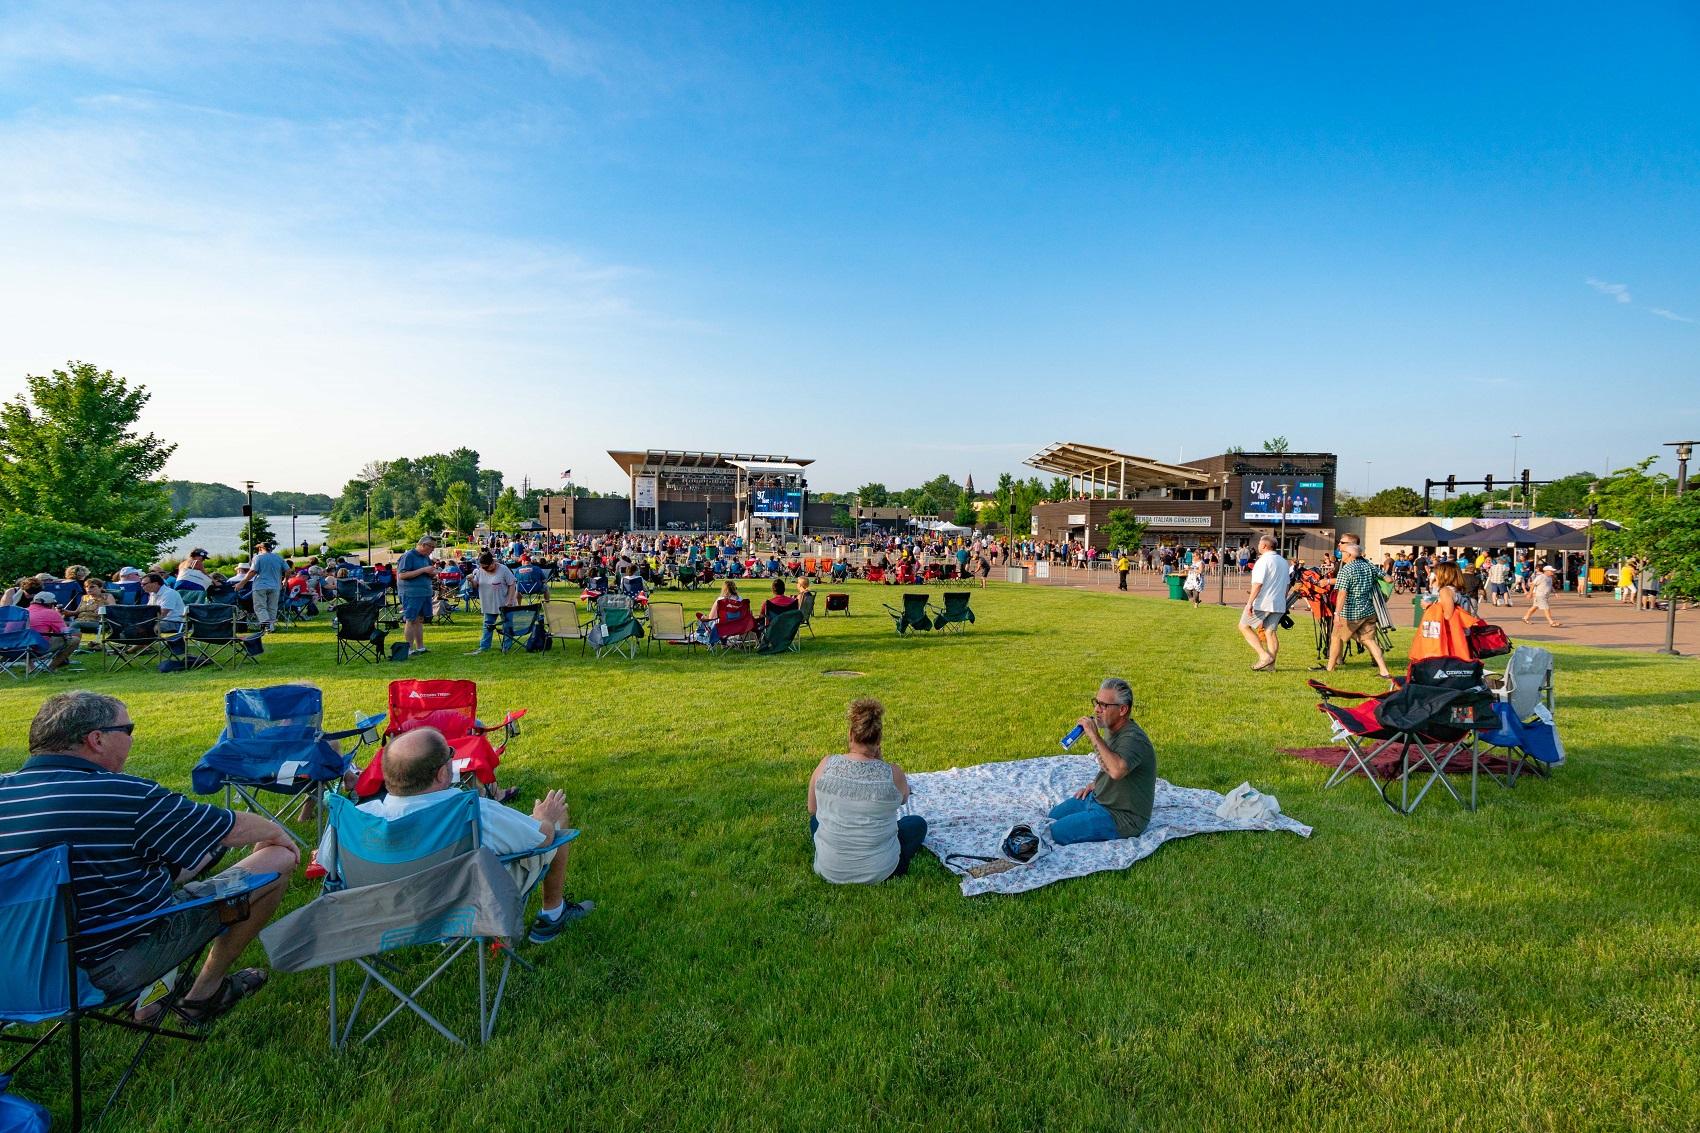 /riveredge-park-concerts-return-july-2021-aurora-il